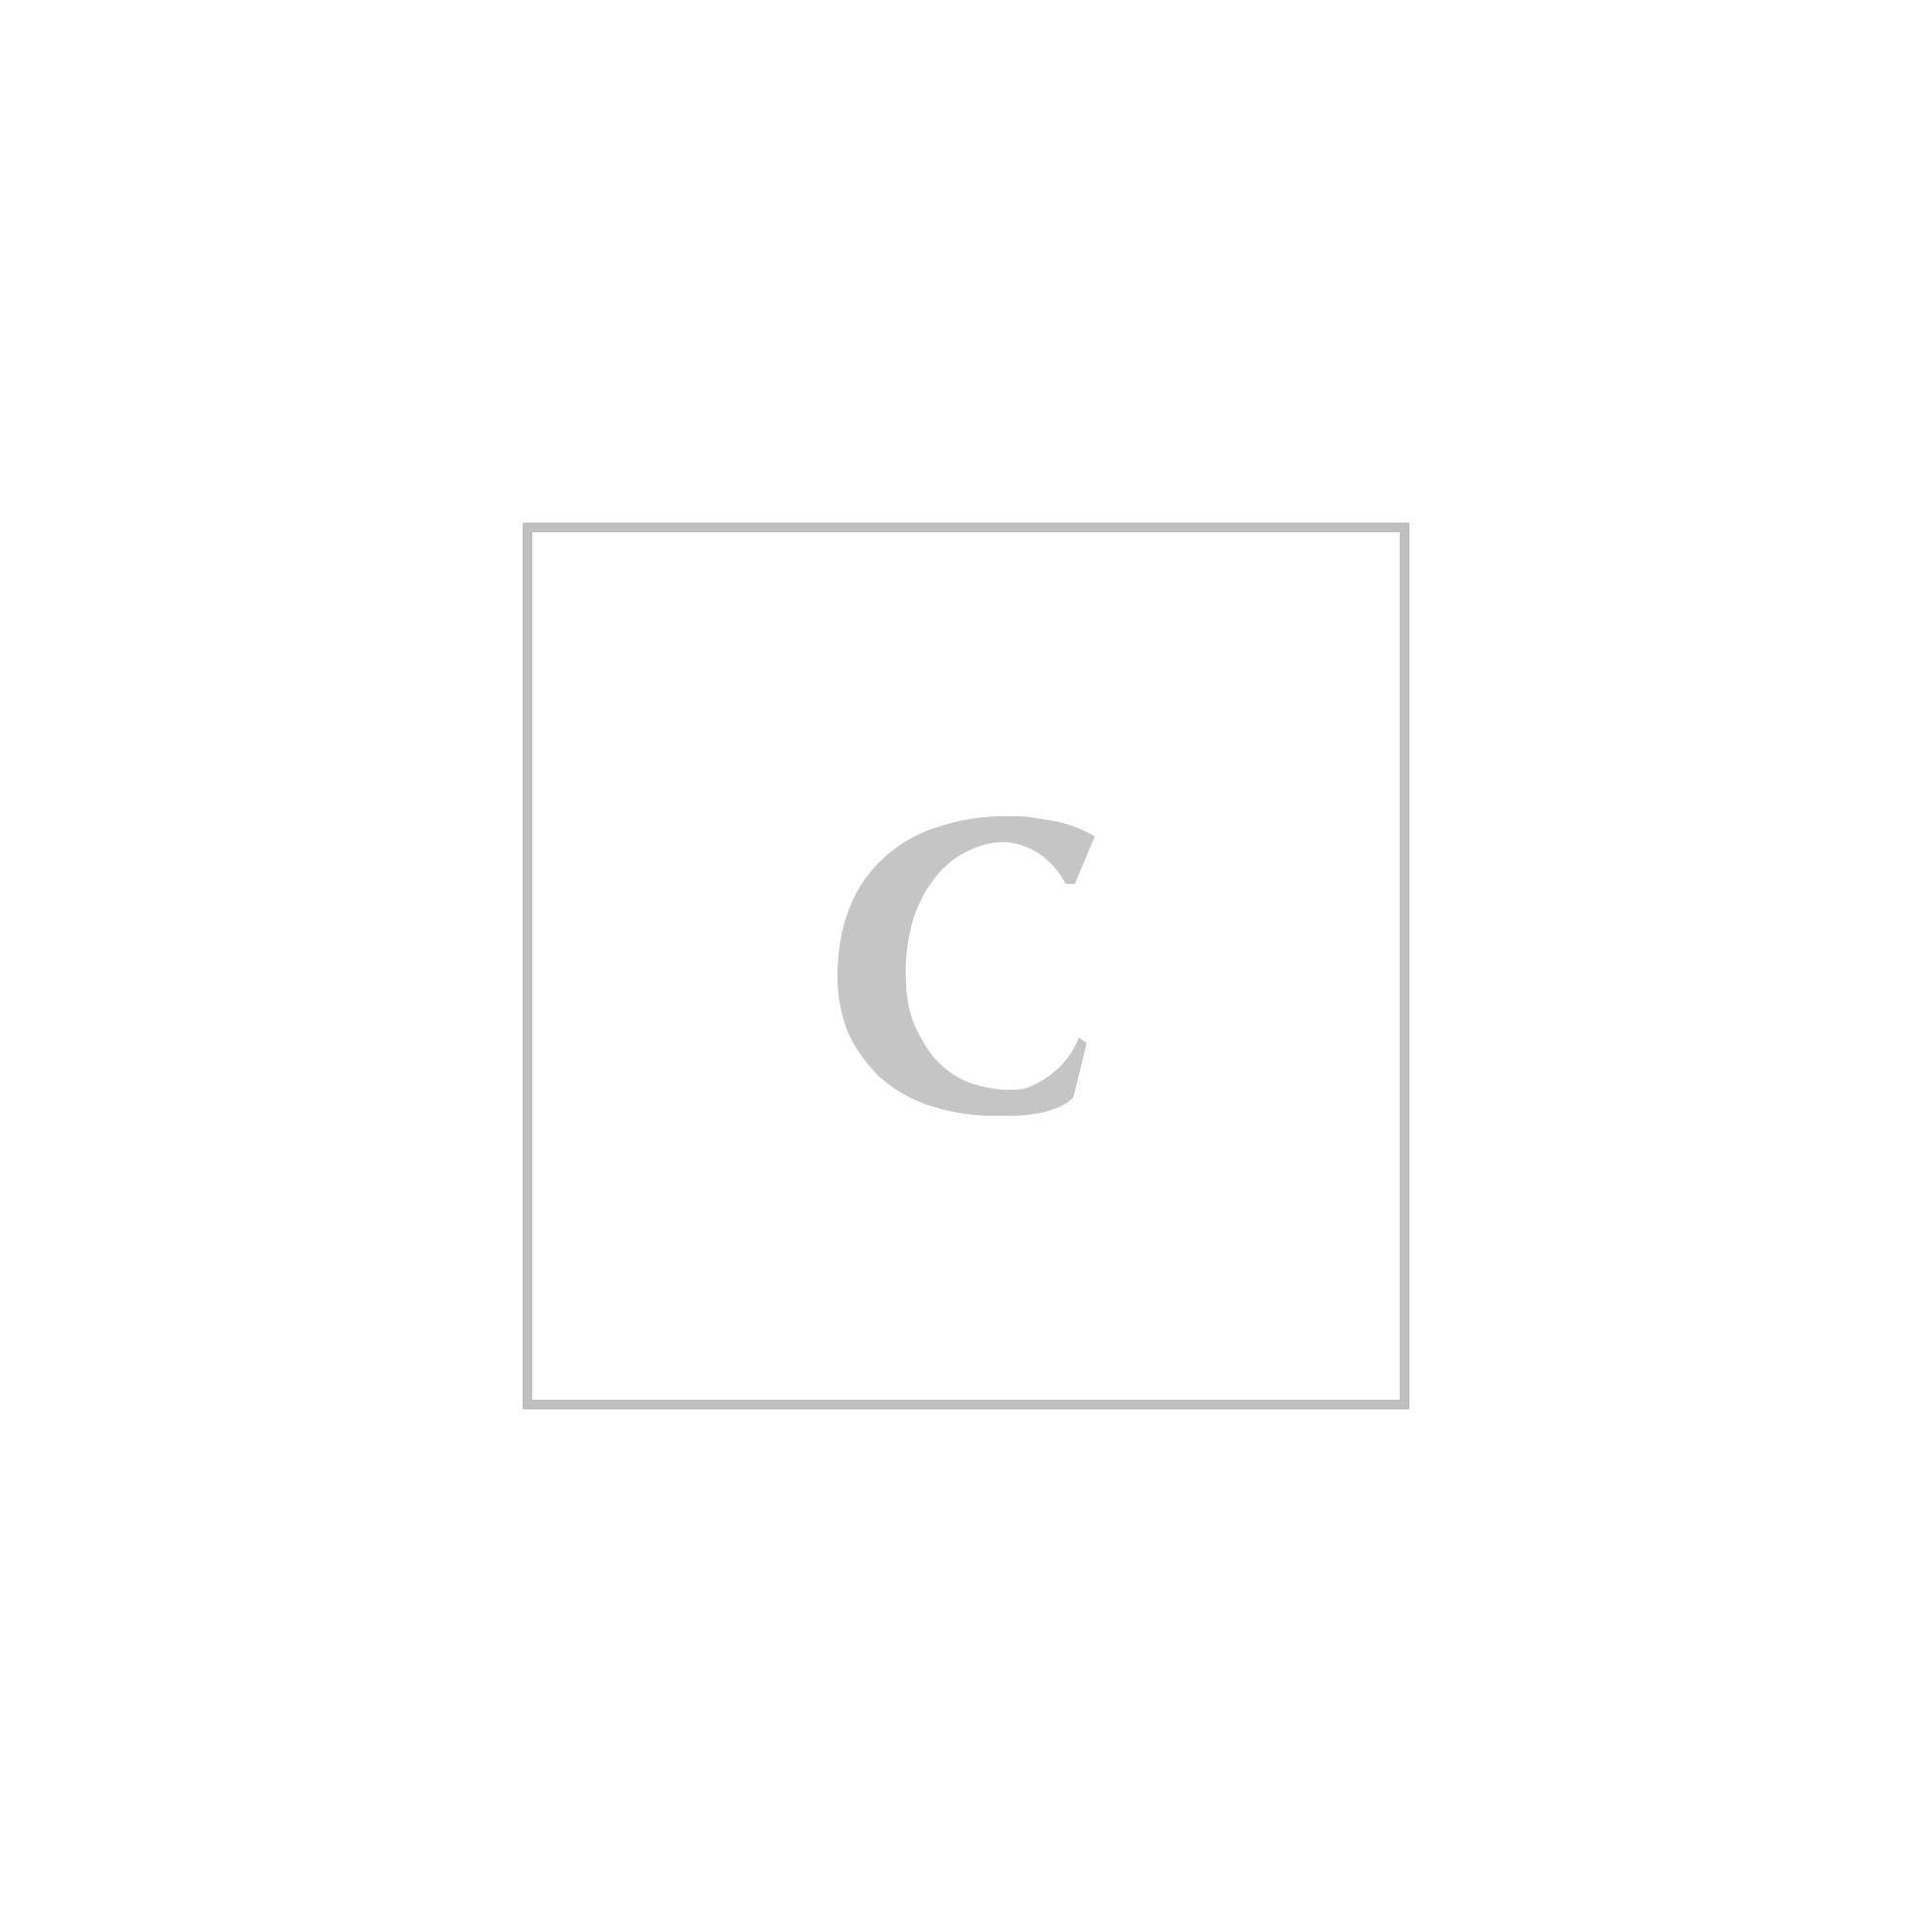 Christian Dior borsa miss dior cannage